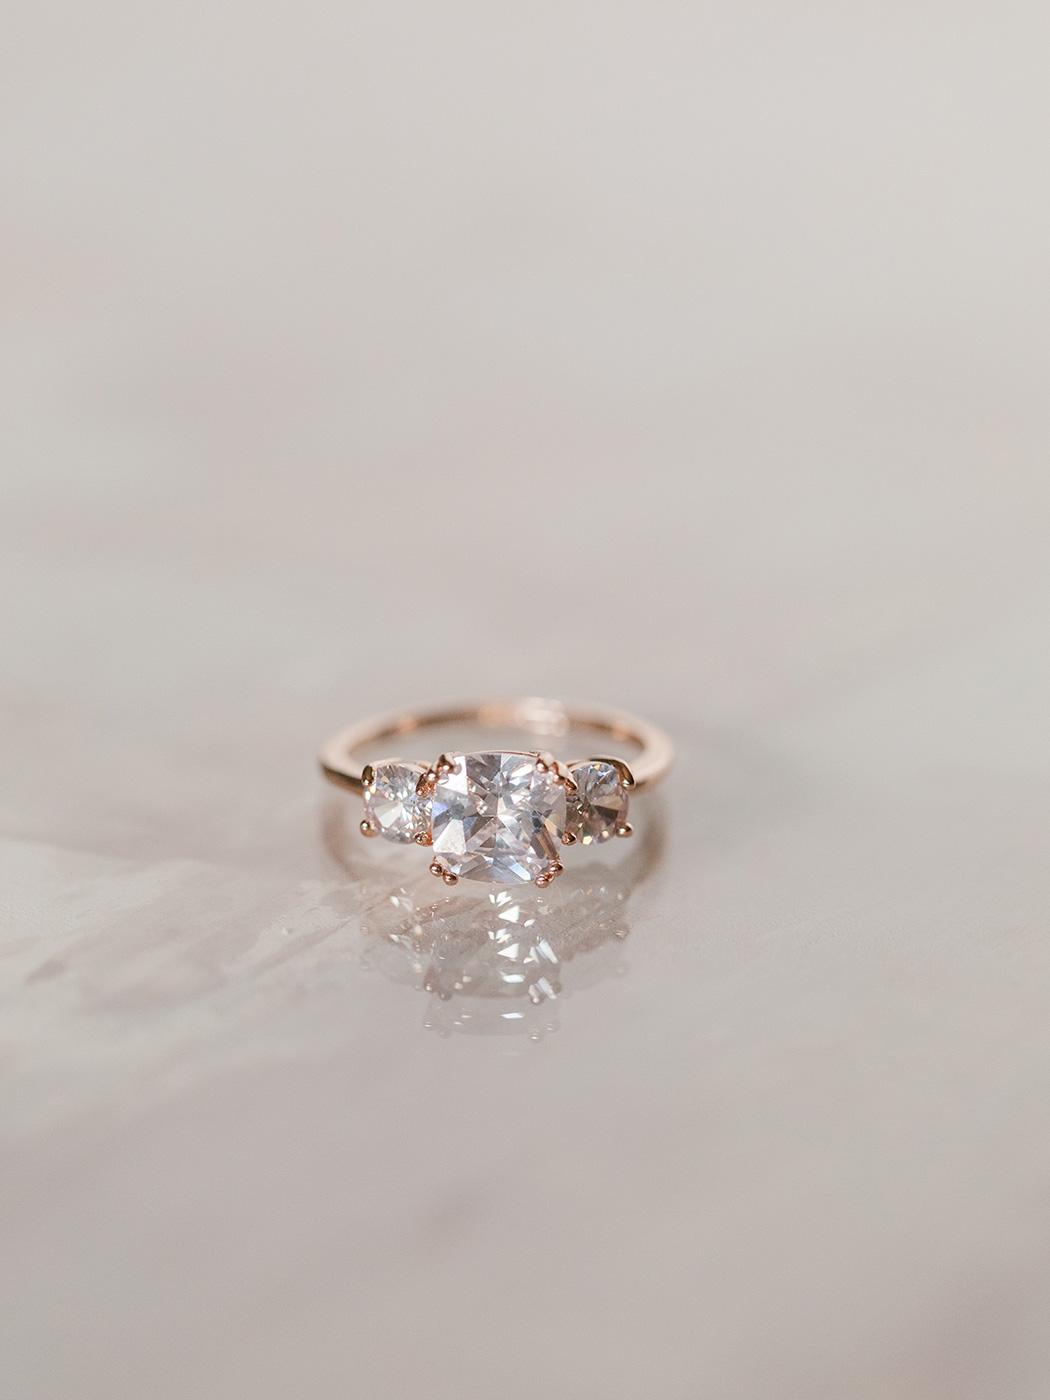 Jewellery by Taneka Storm | Rensche Mari